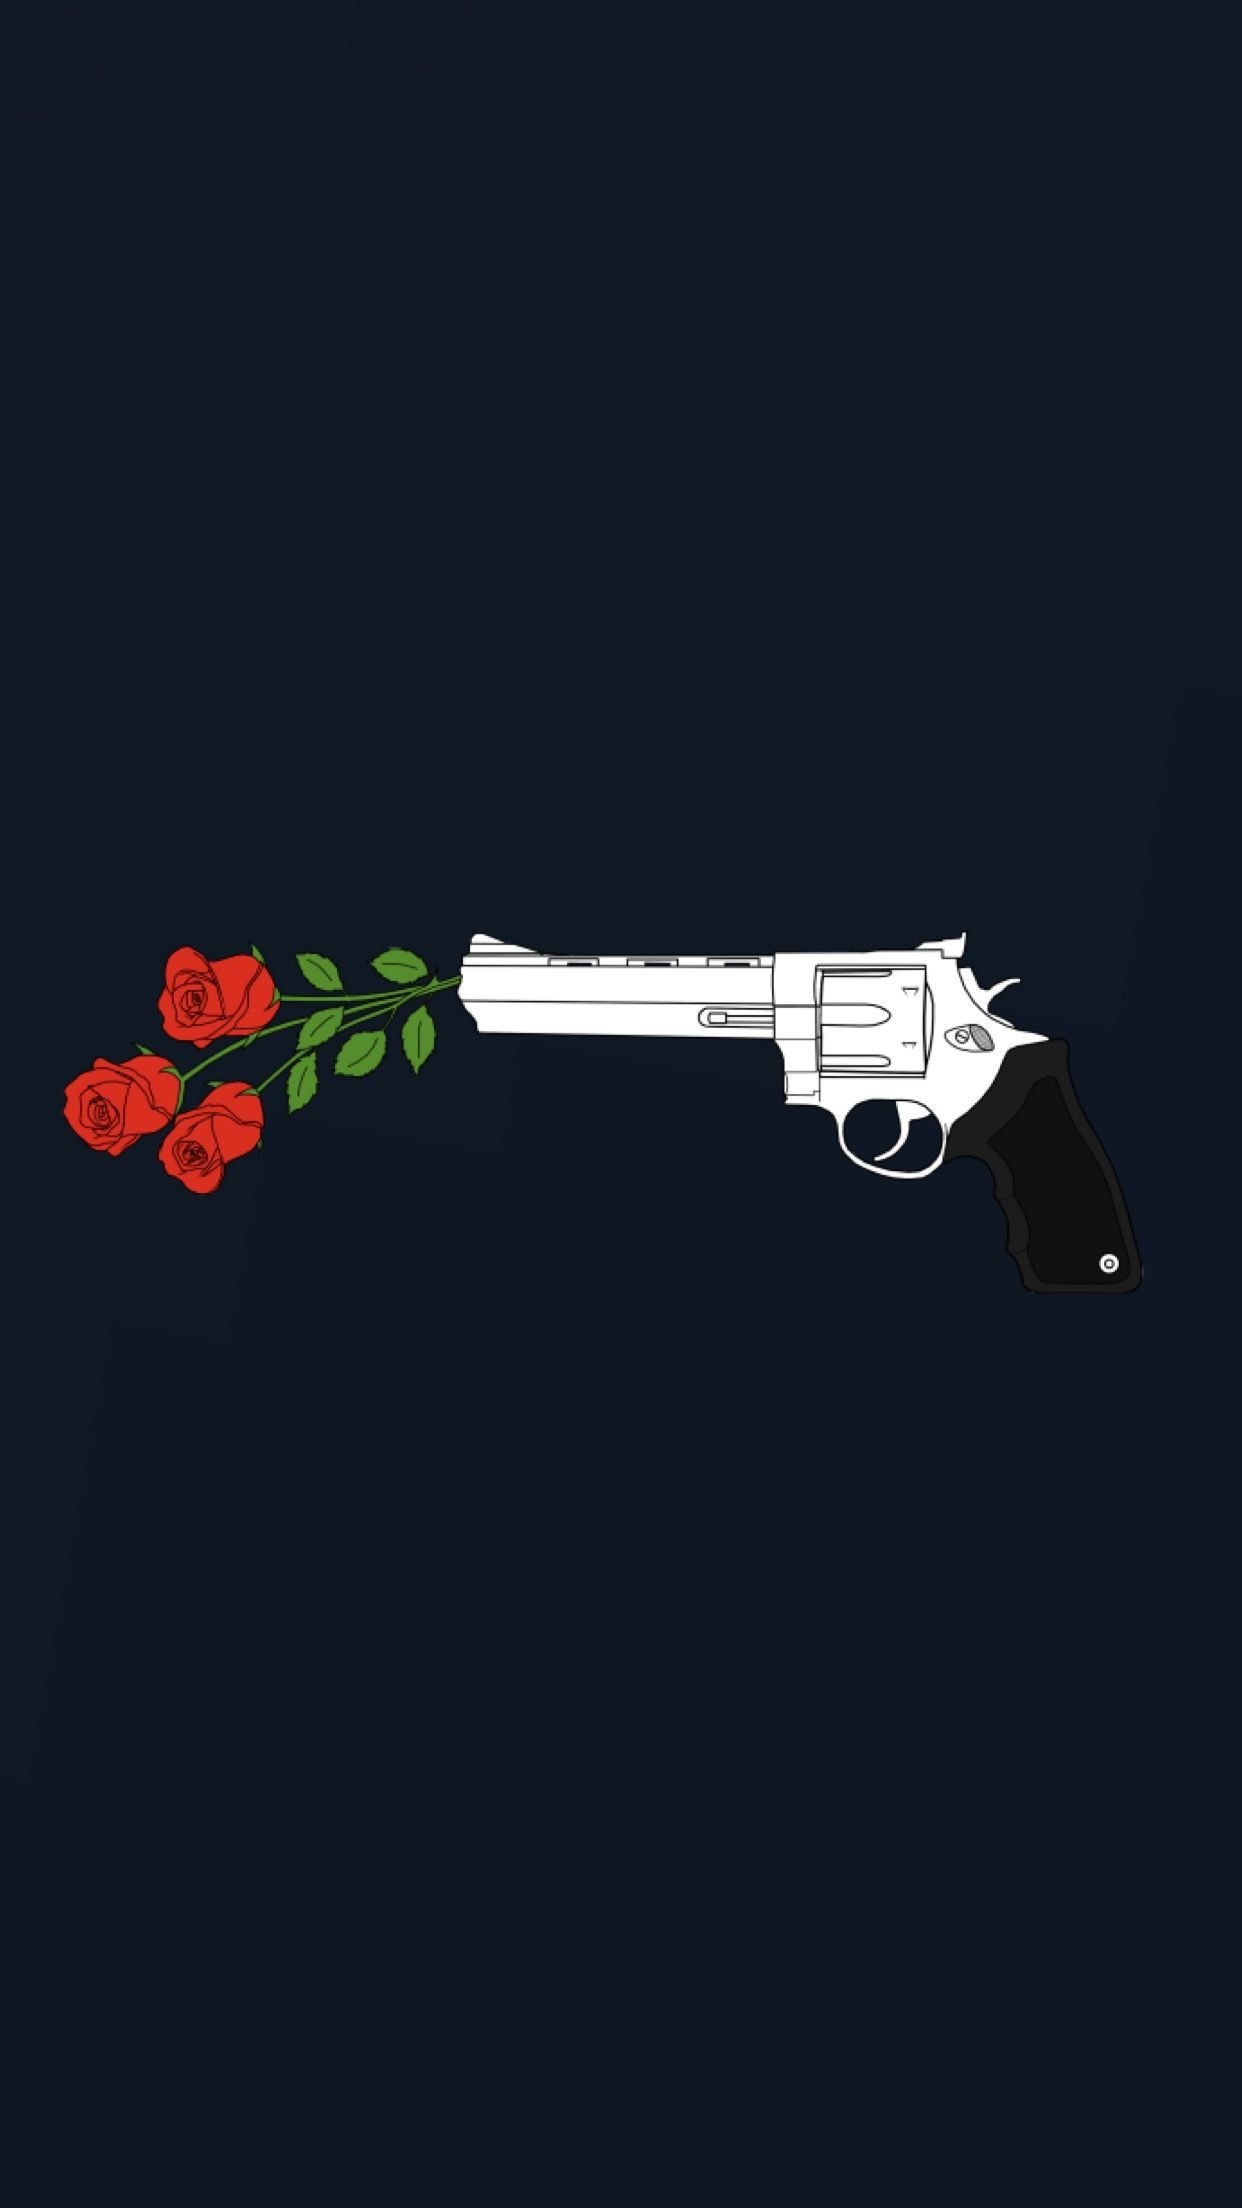 Res: 1242x2208, Kill them with roses wallpaper | made by Laurette |  instagram:@laurette_evonen